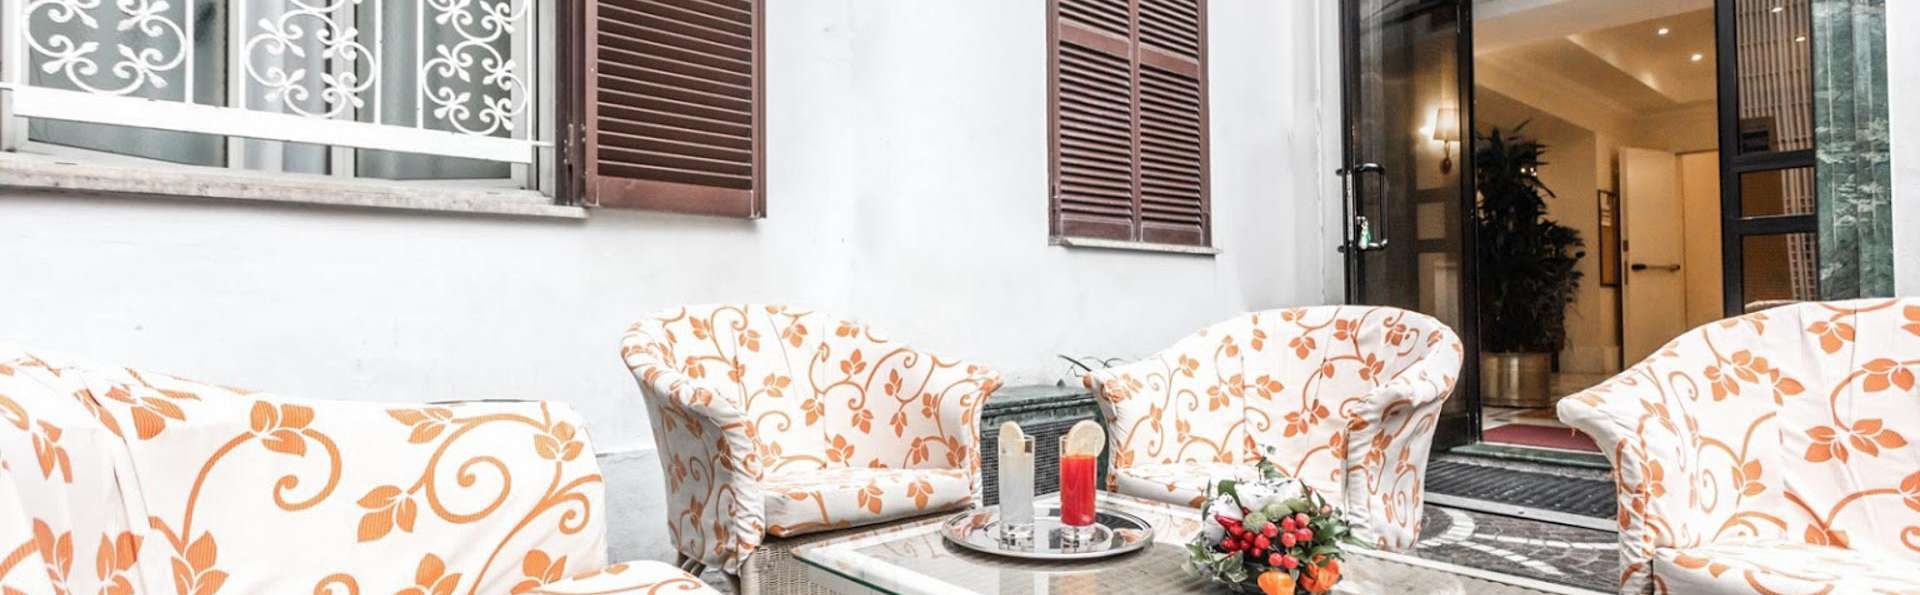 Raeli Hotel Lazio - EDIT_TERRACE_01.jpg